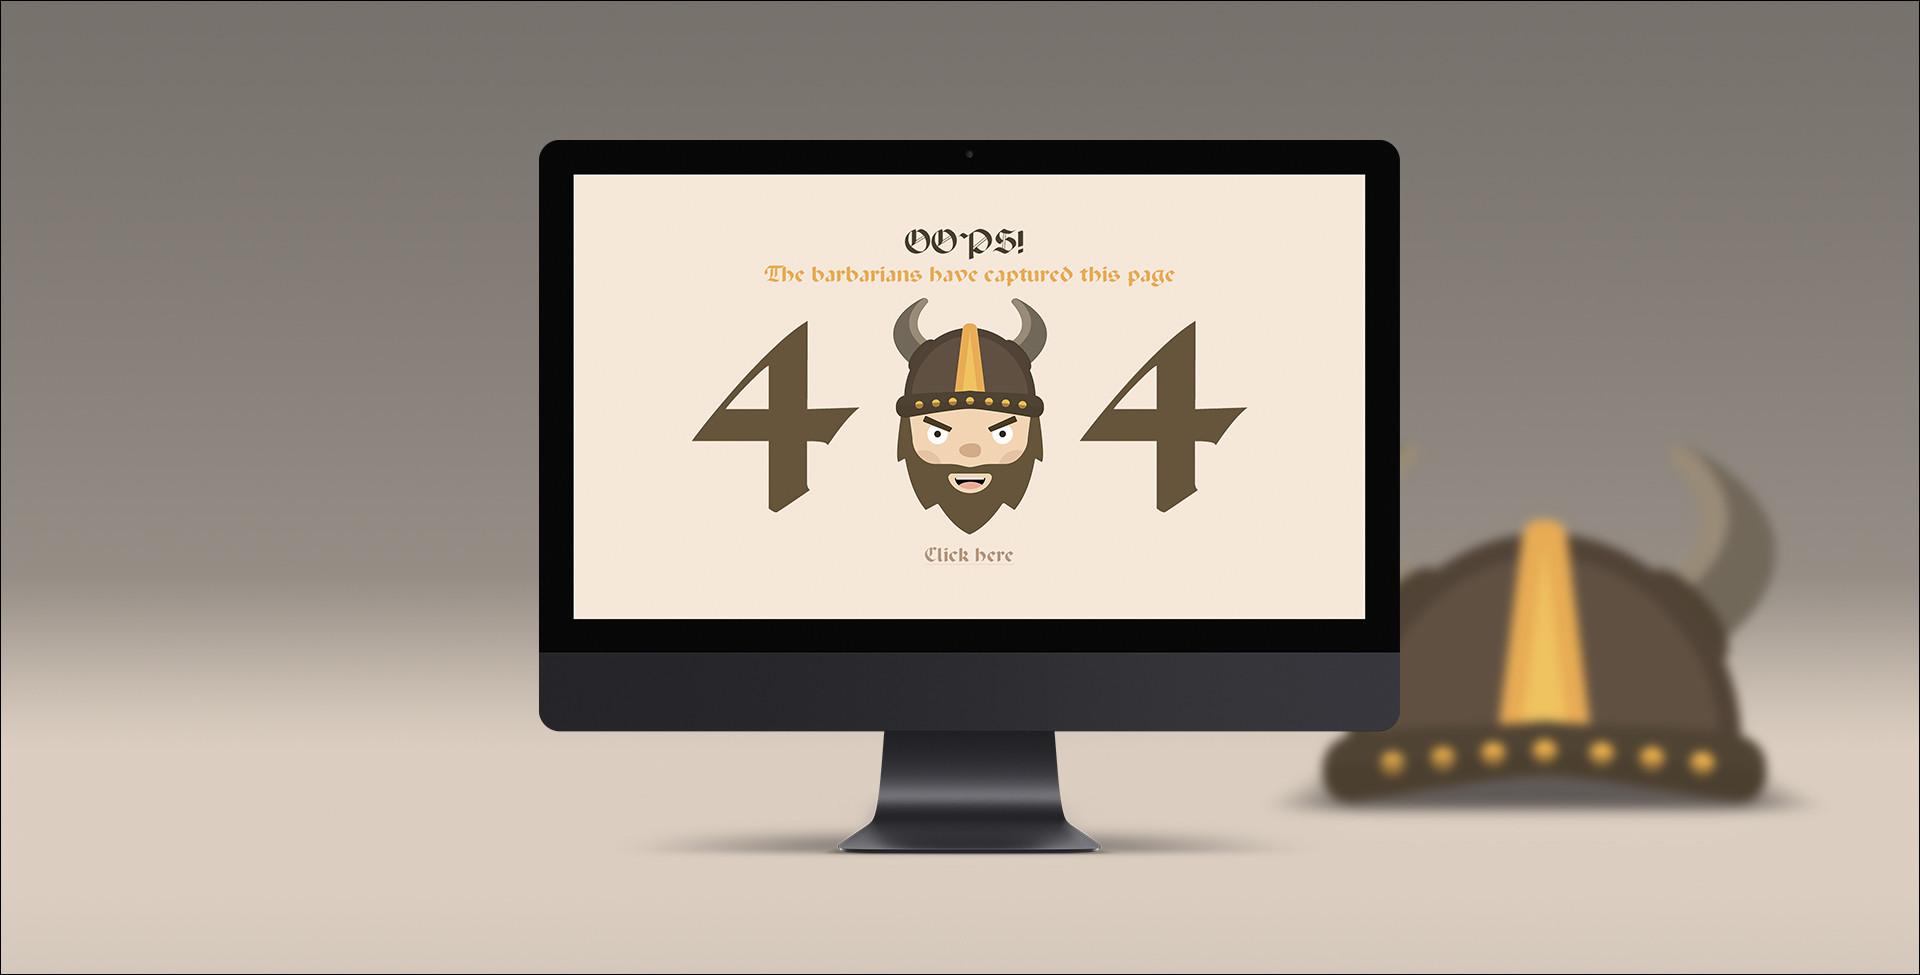 Combo 21 team 404 2 b 1